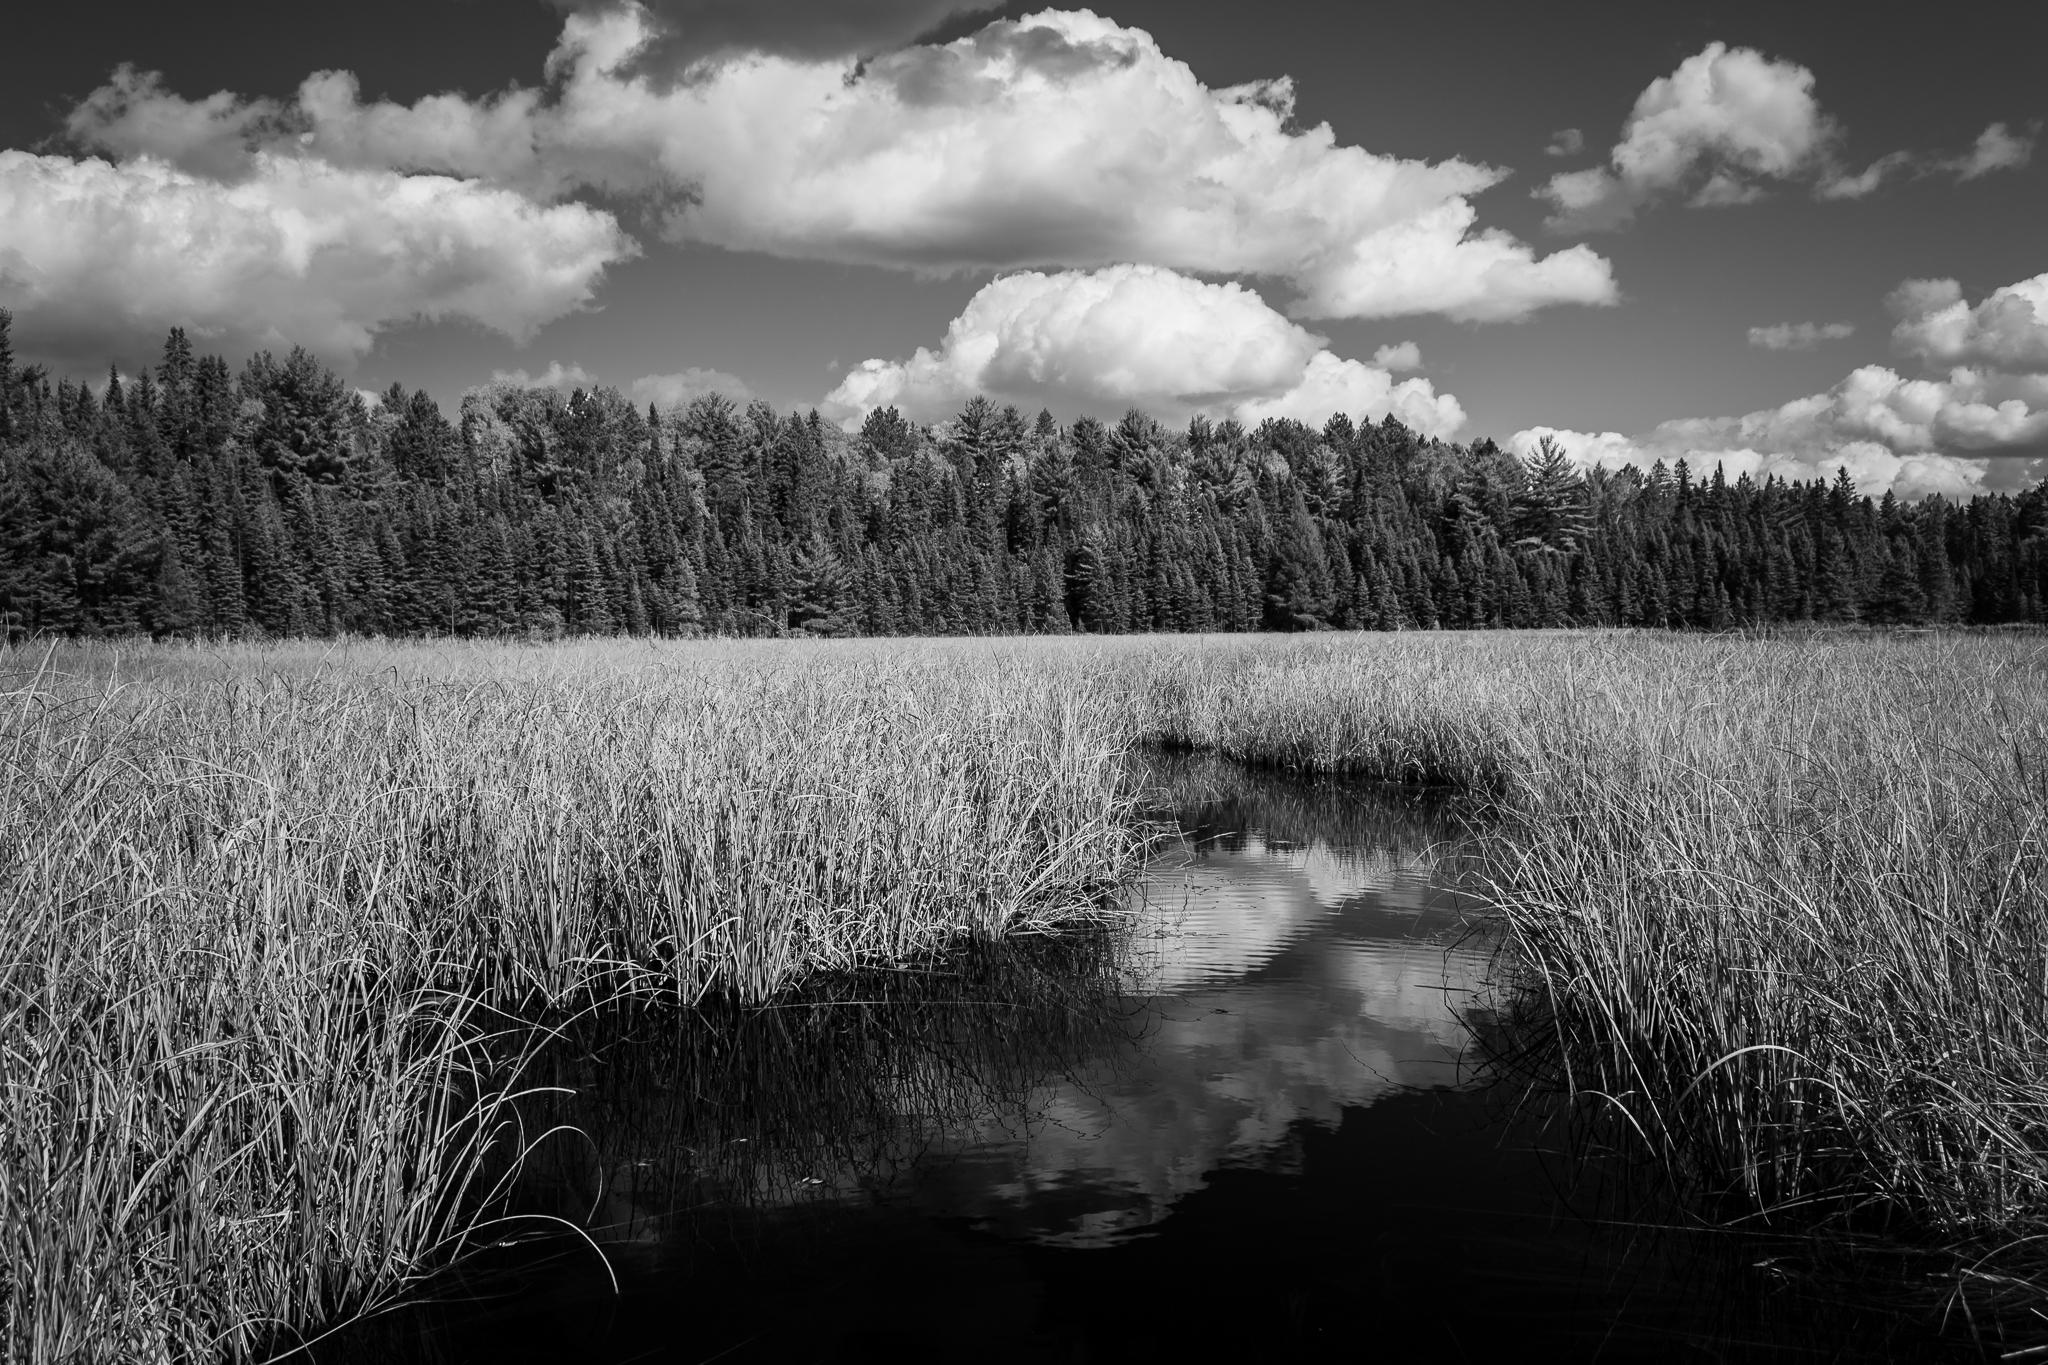 Beaver Pond Creek (1/125s, f/8, ISO100)